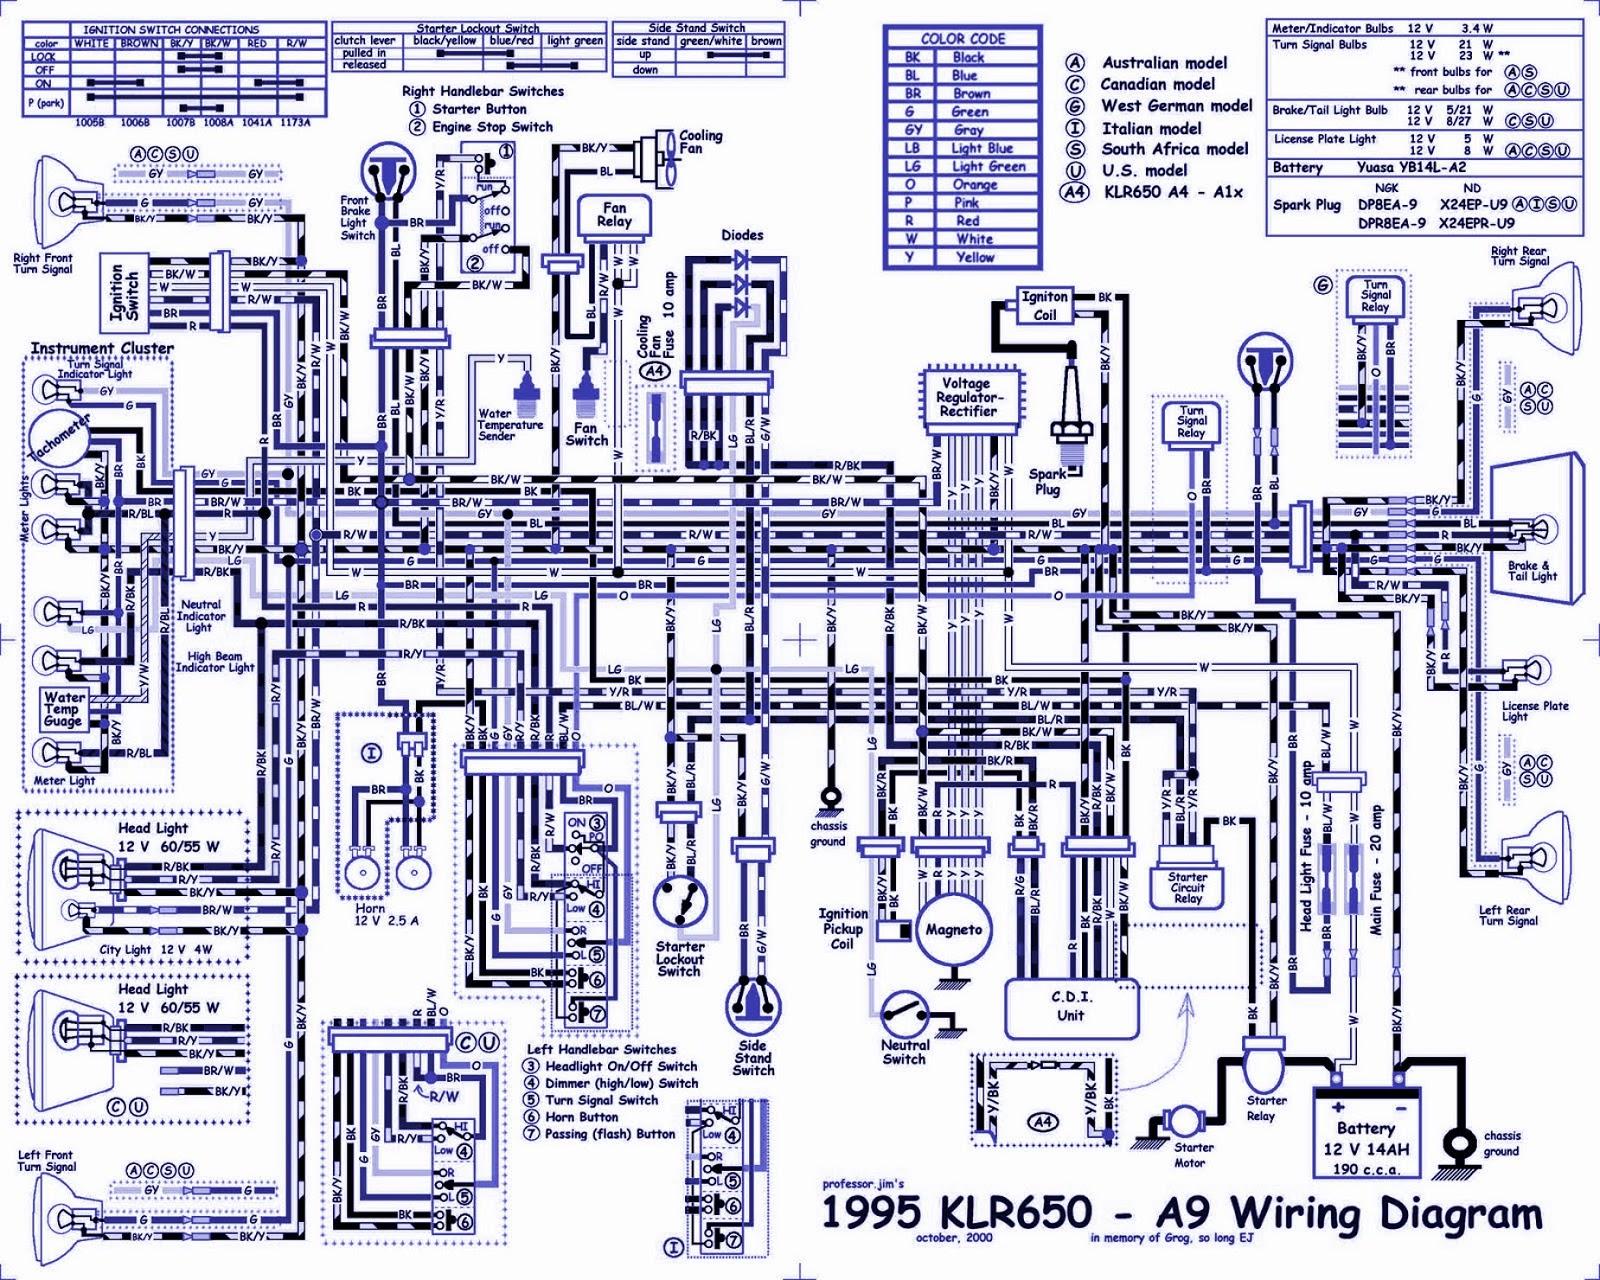 2001 saab 9 3 stereo wiring diagram static phase converter 1998 900 convertible best librarysaab headlight library rh